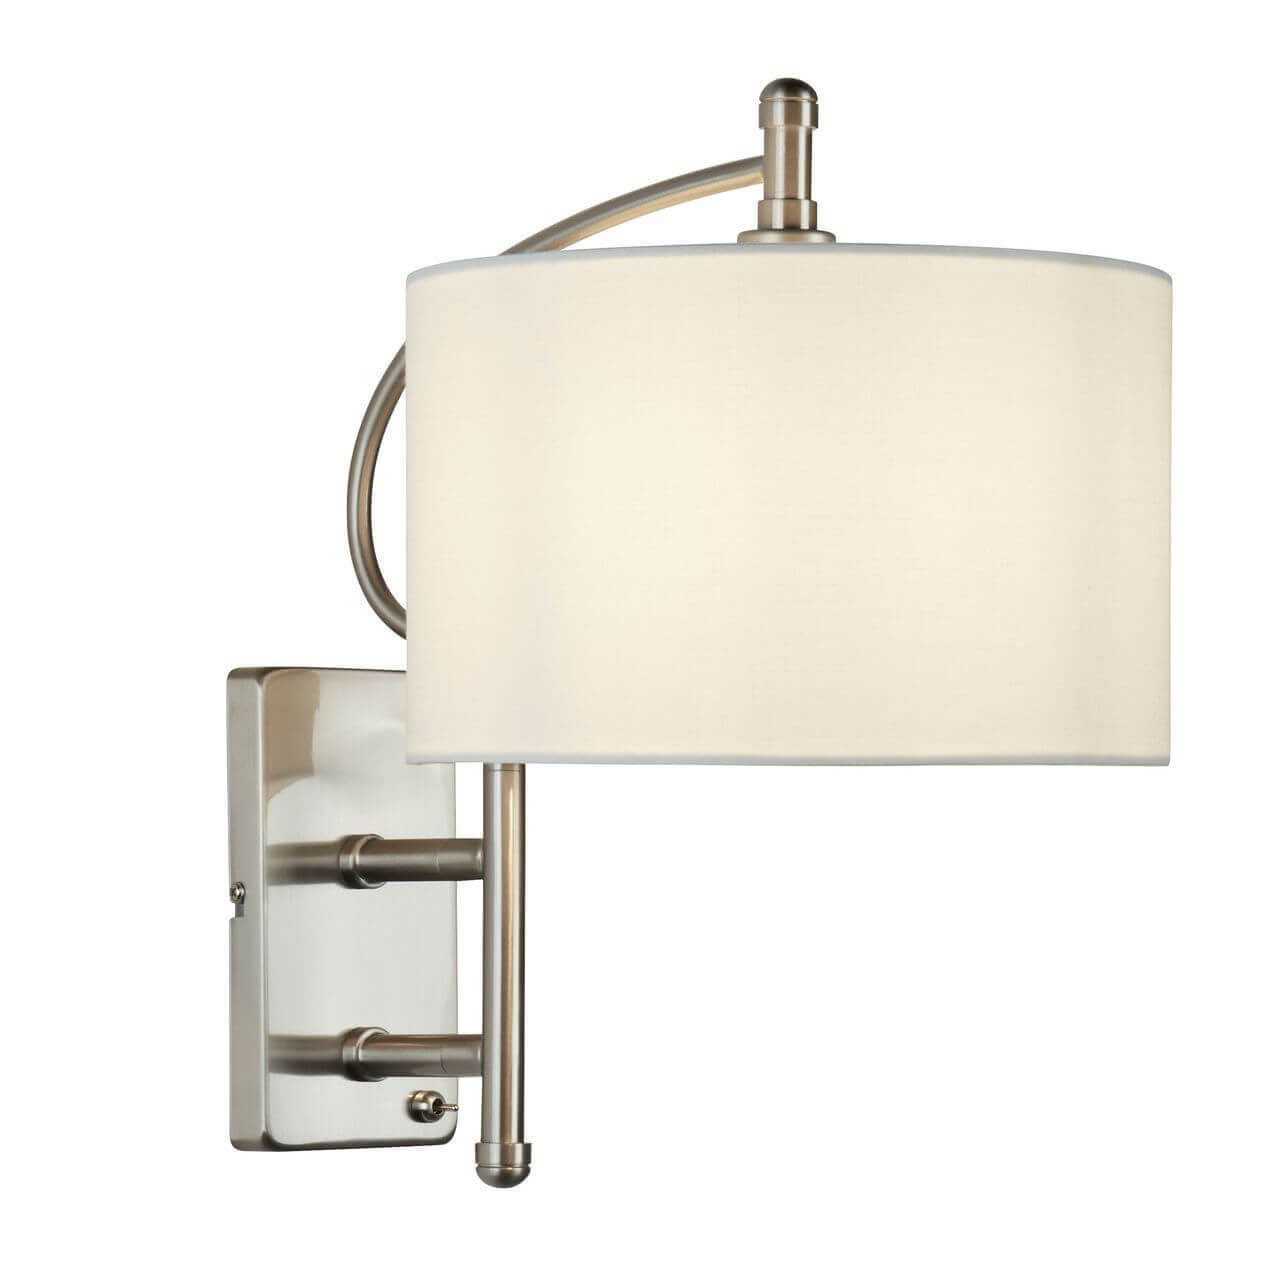 Бра Arte Lamp A2999AP-1SS Adige arte lamp бра arte lamp 78 a7957ap 1ss